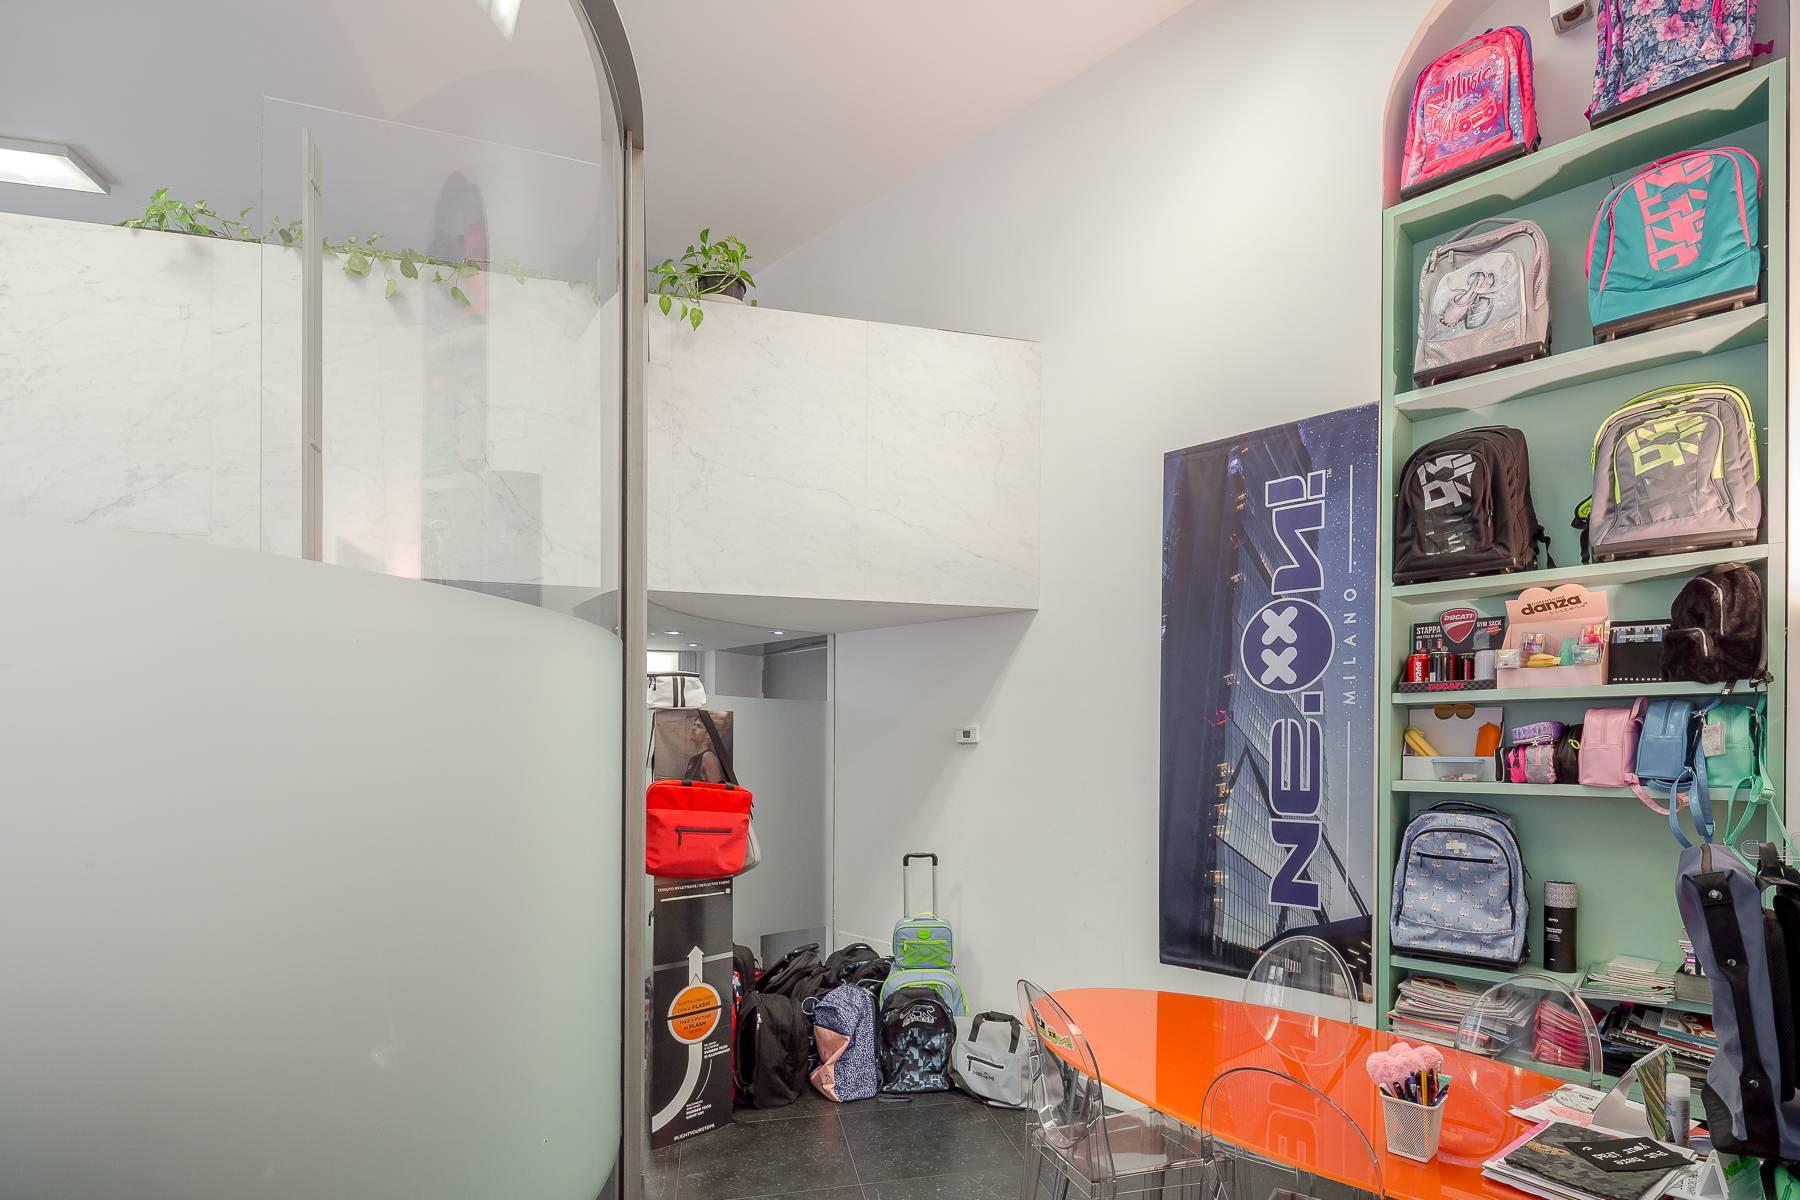 Opne-Space Büro / Wohnimmobilie auf der Piazza Giovine Italia / Via Aurelio Saffi - 23